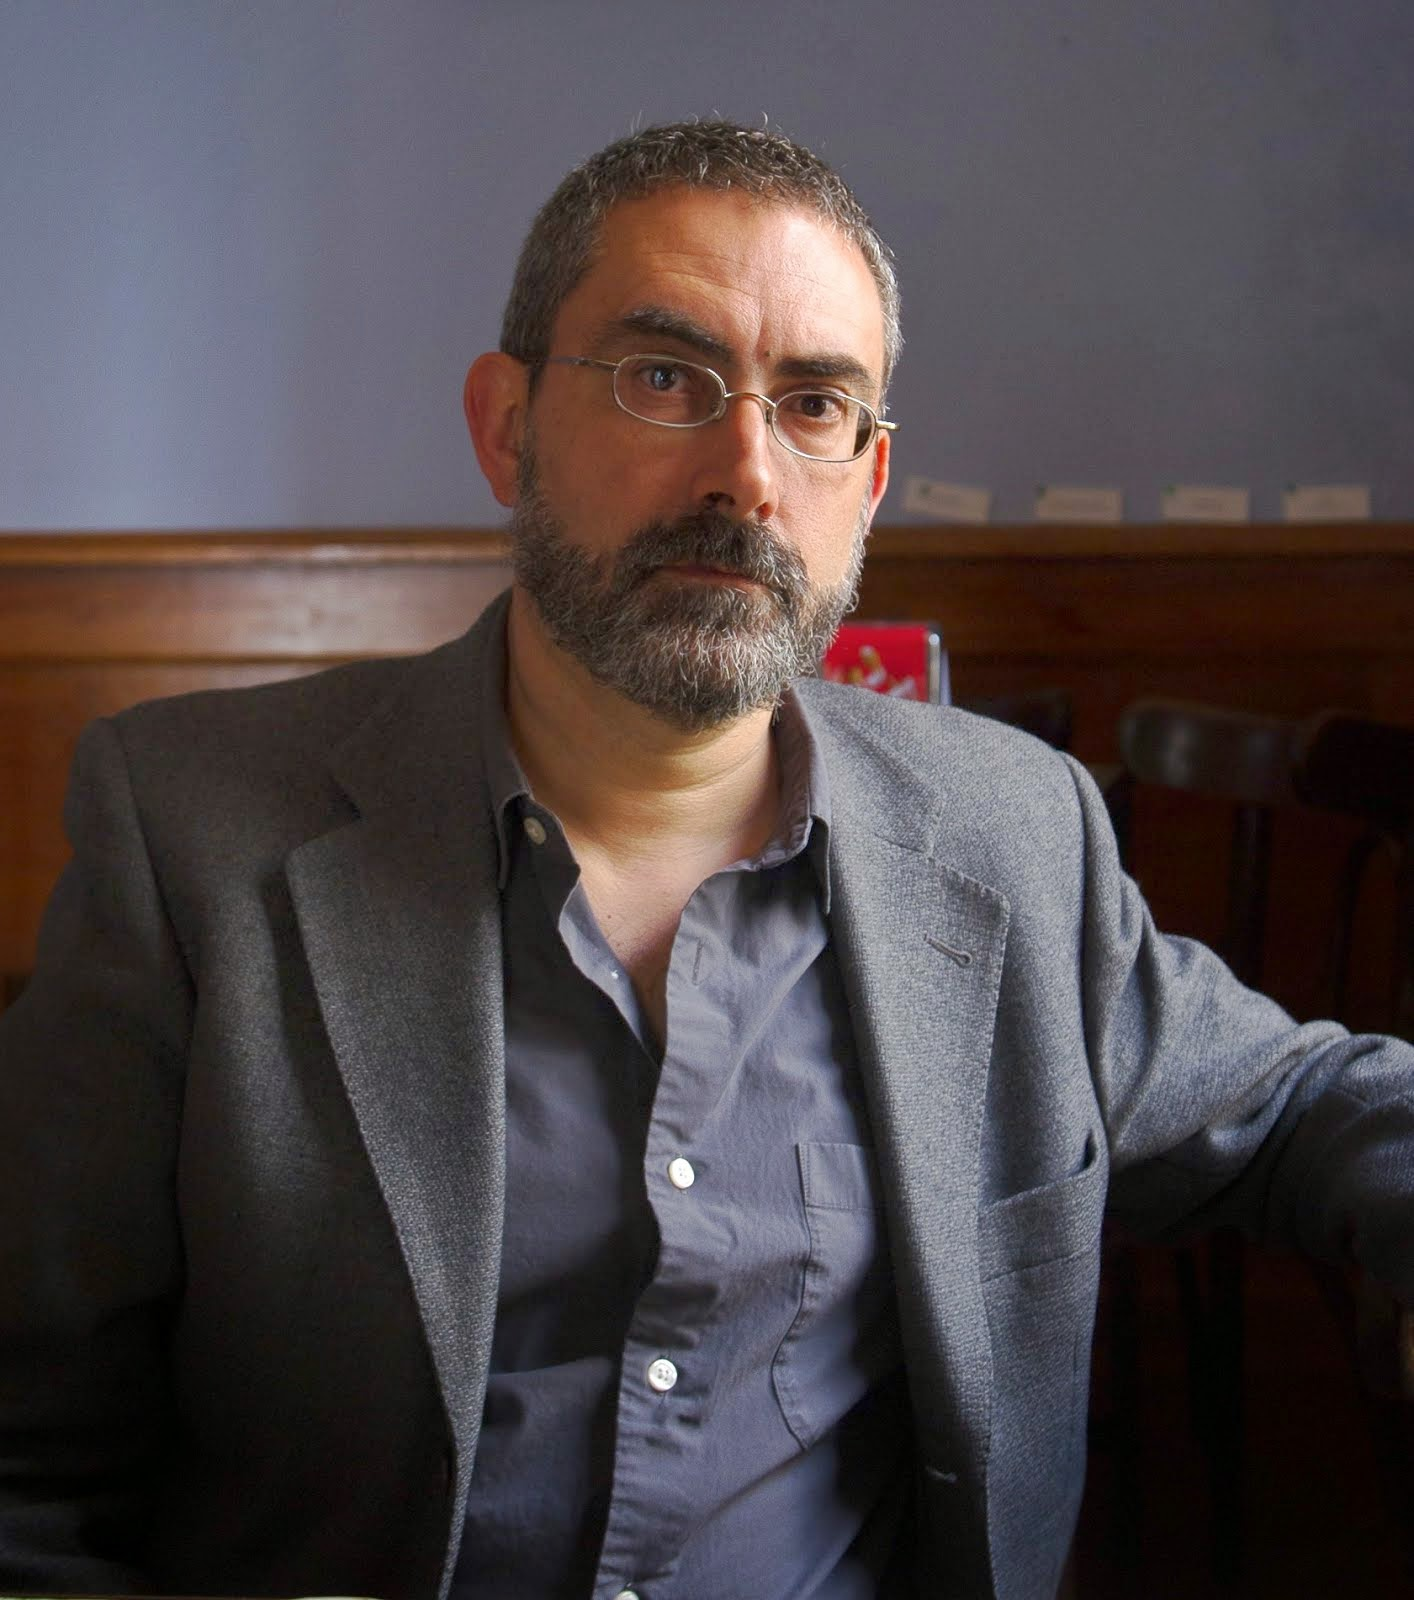 La invasión de los libros. Antonio Rivero Taravillo